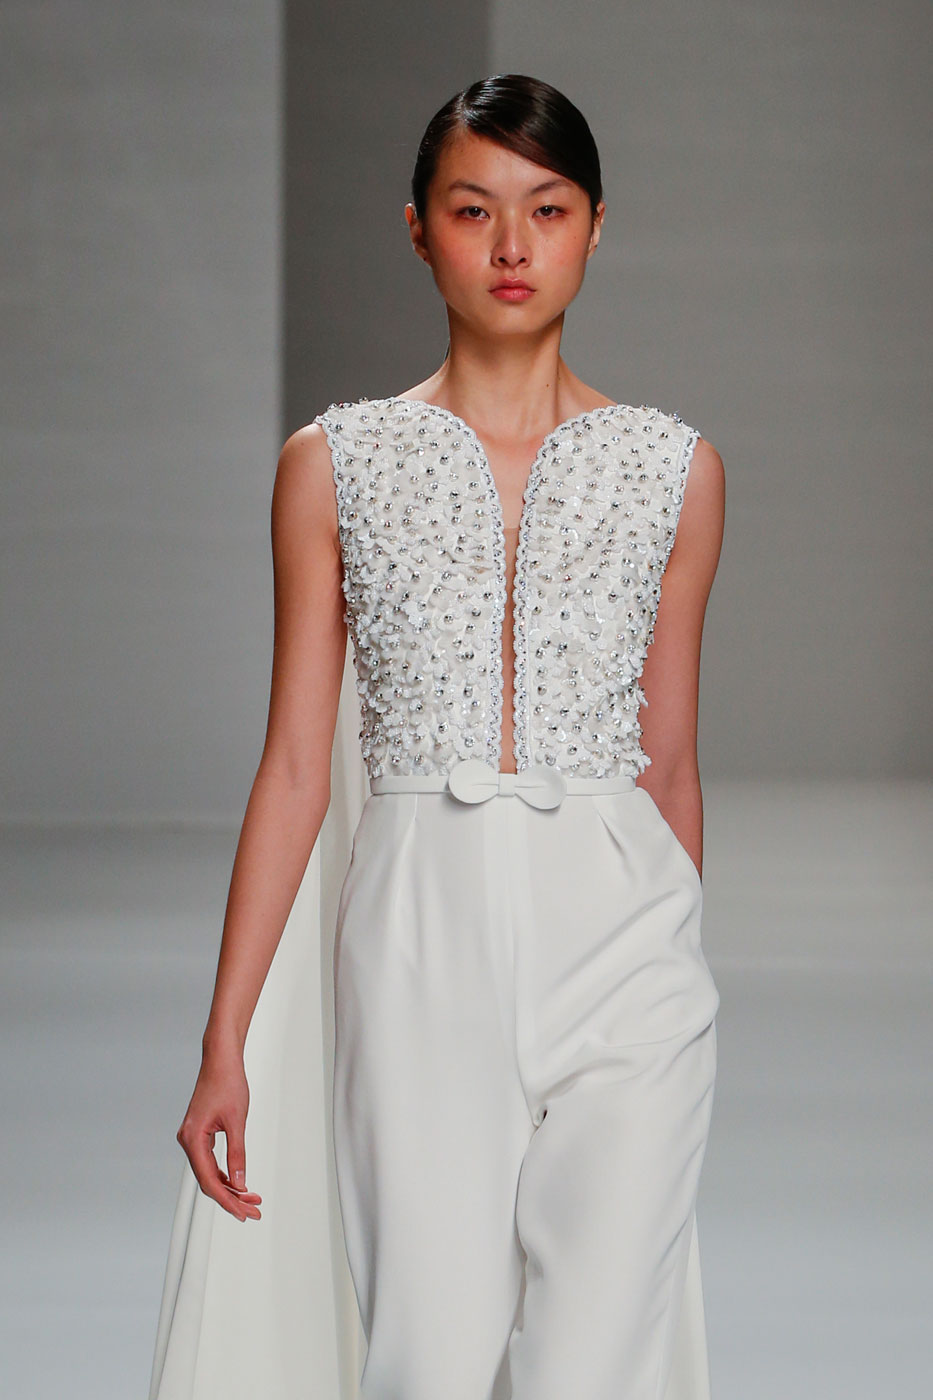 Georges-Hobeika-fashion-runway-show-haute-couture-paris-spring-2015-the-impression-32